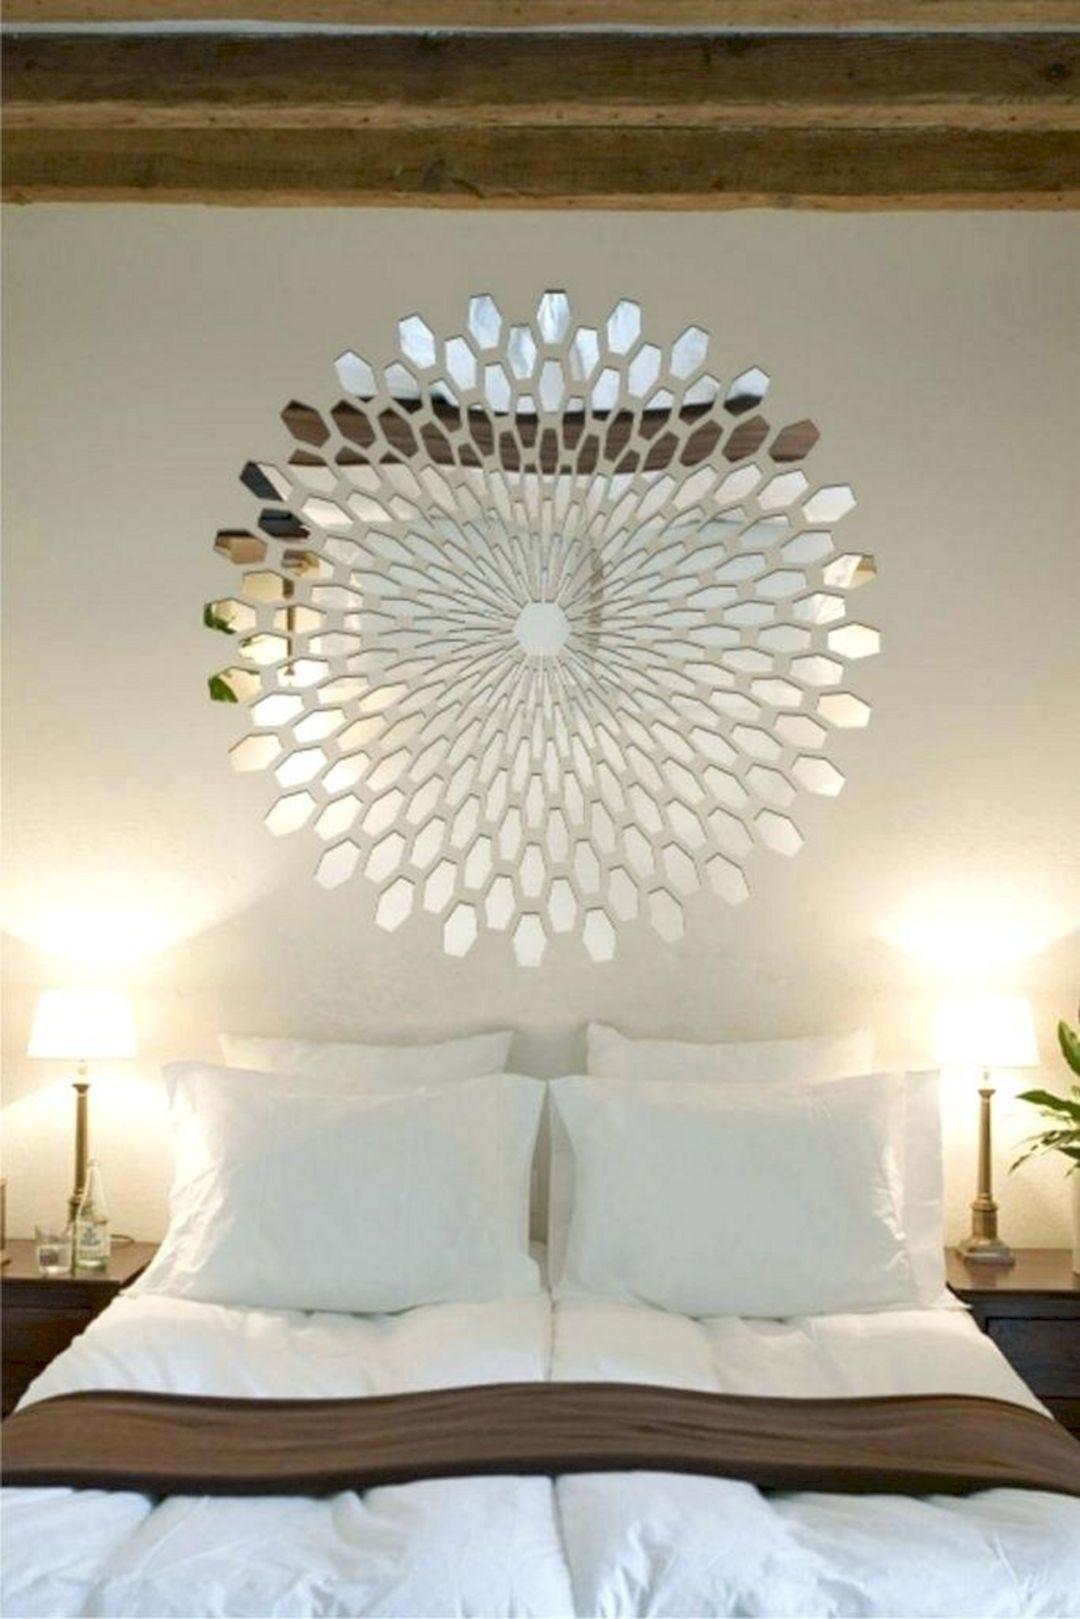 15 Stylish Glass Wall Decoration Ideas To Increase Your Home Decorits Home Decor Decor Room Decor